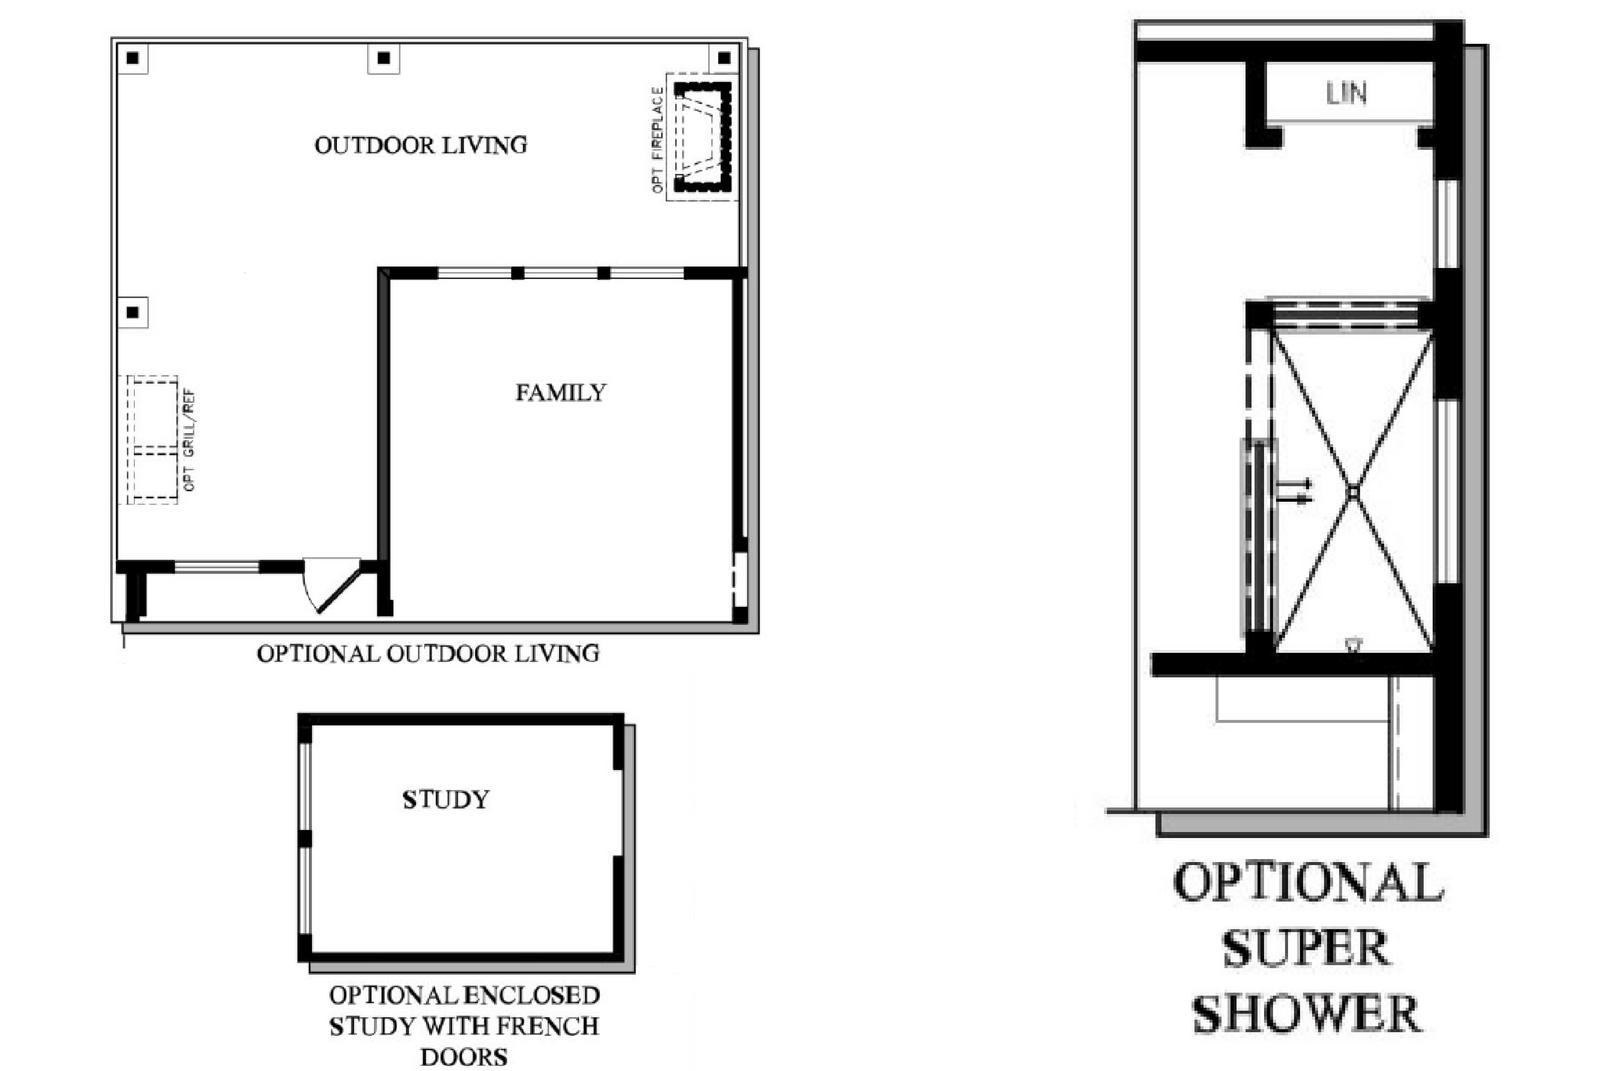 David Weekley Homes Floor Plans Texas: 6922 Russet Oak Lane